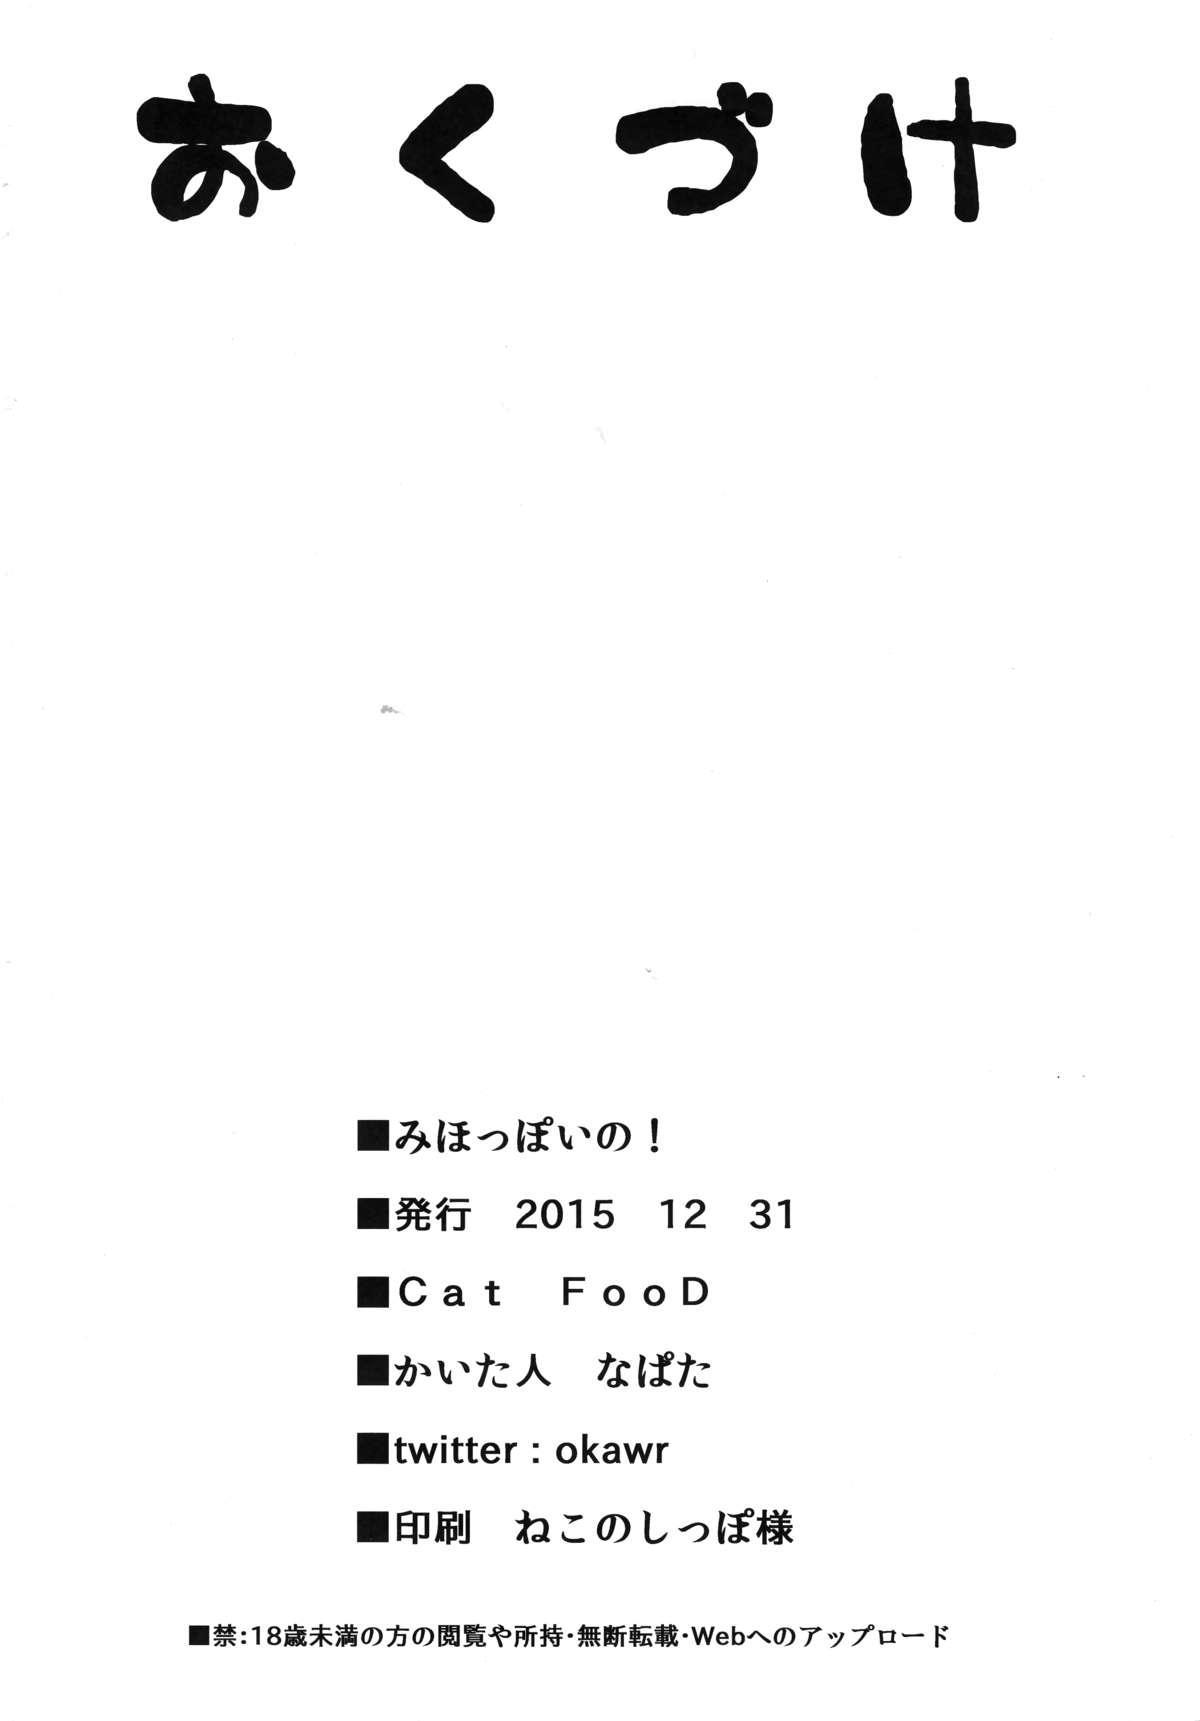 Miho-ppoi no! 17